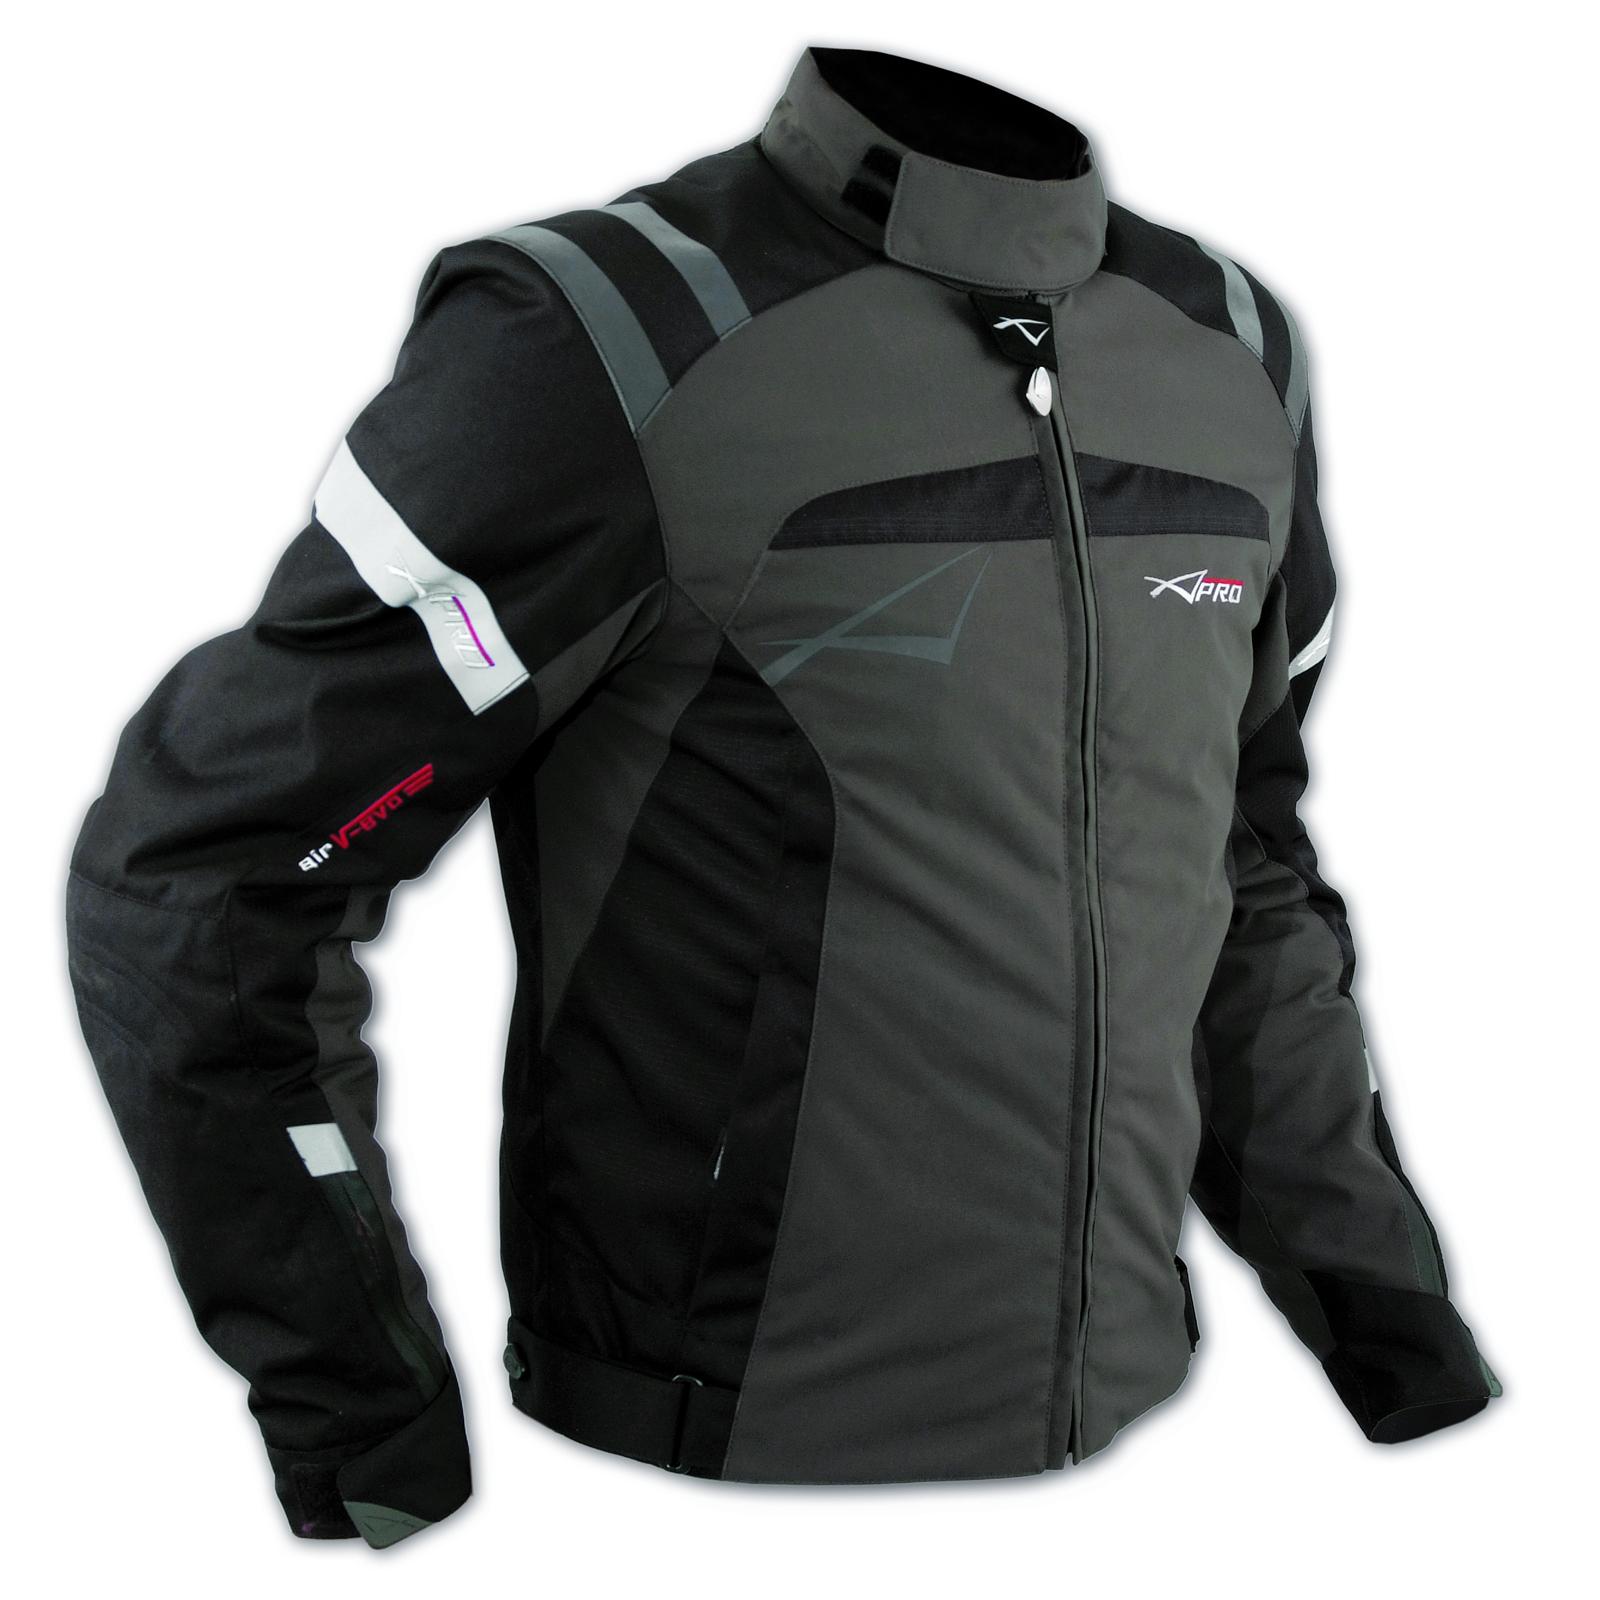 blouson textile motard sport protections doublure hiver moto veste touring brun ebay. Black Bedroom Furniture Sets. Home Design Ideas